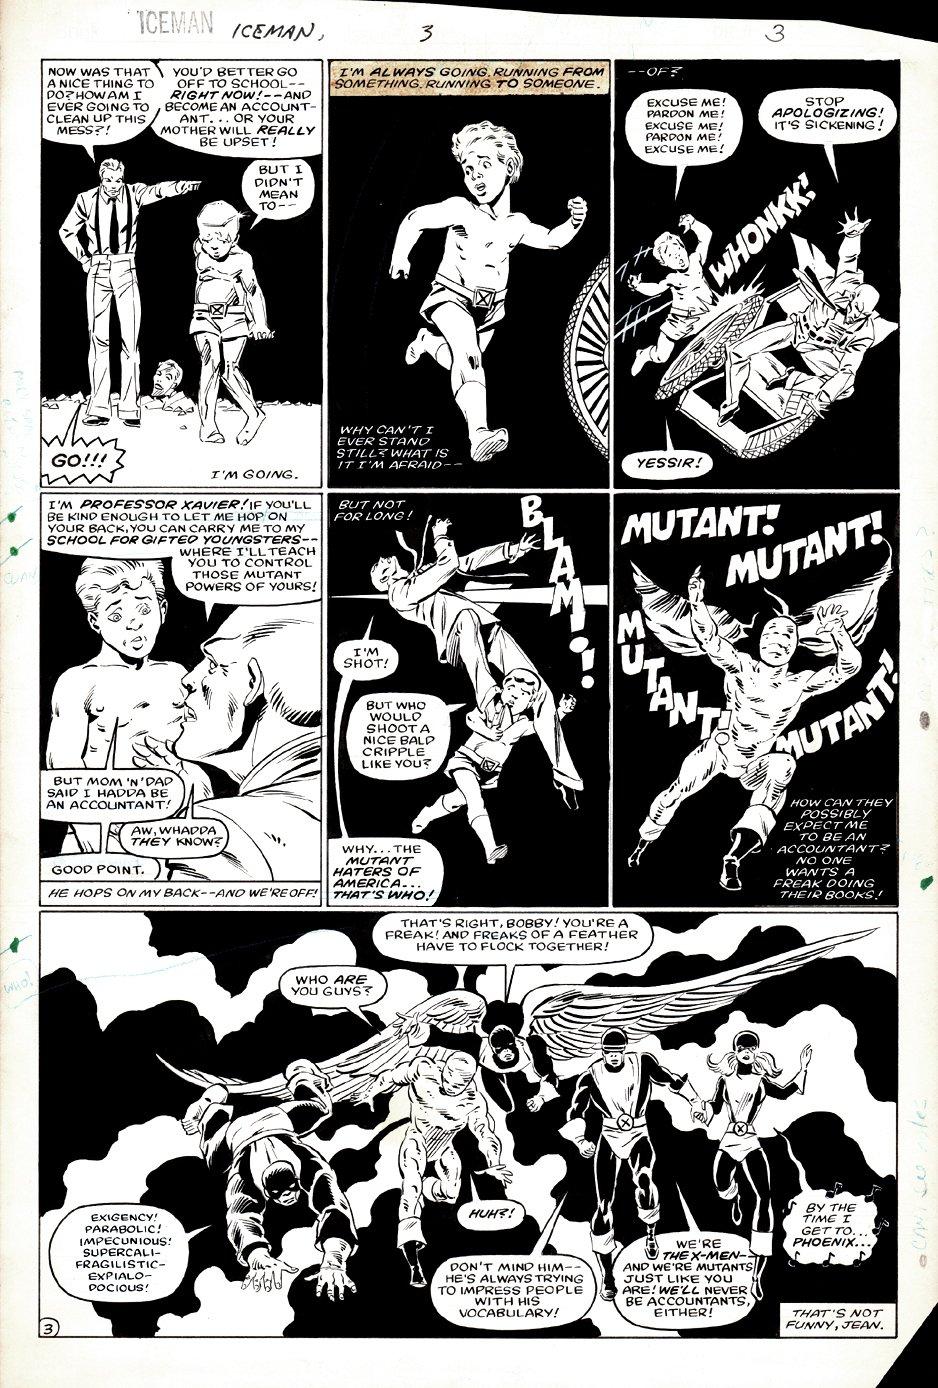 Iceman #3 p 3 (Professor X & ALL 5 ORIGINAL X-MEN!) 1984